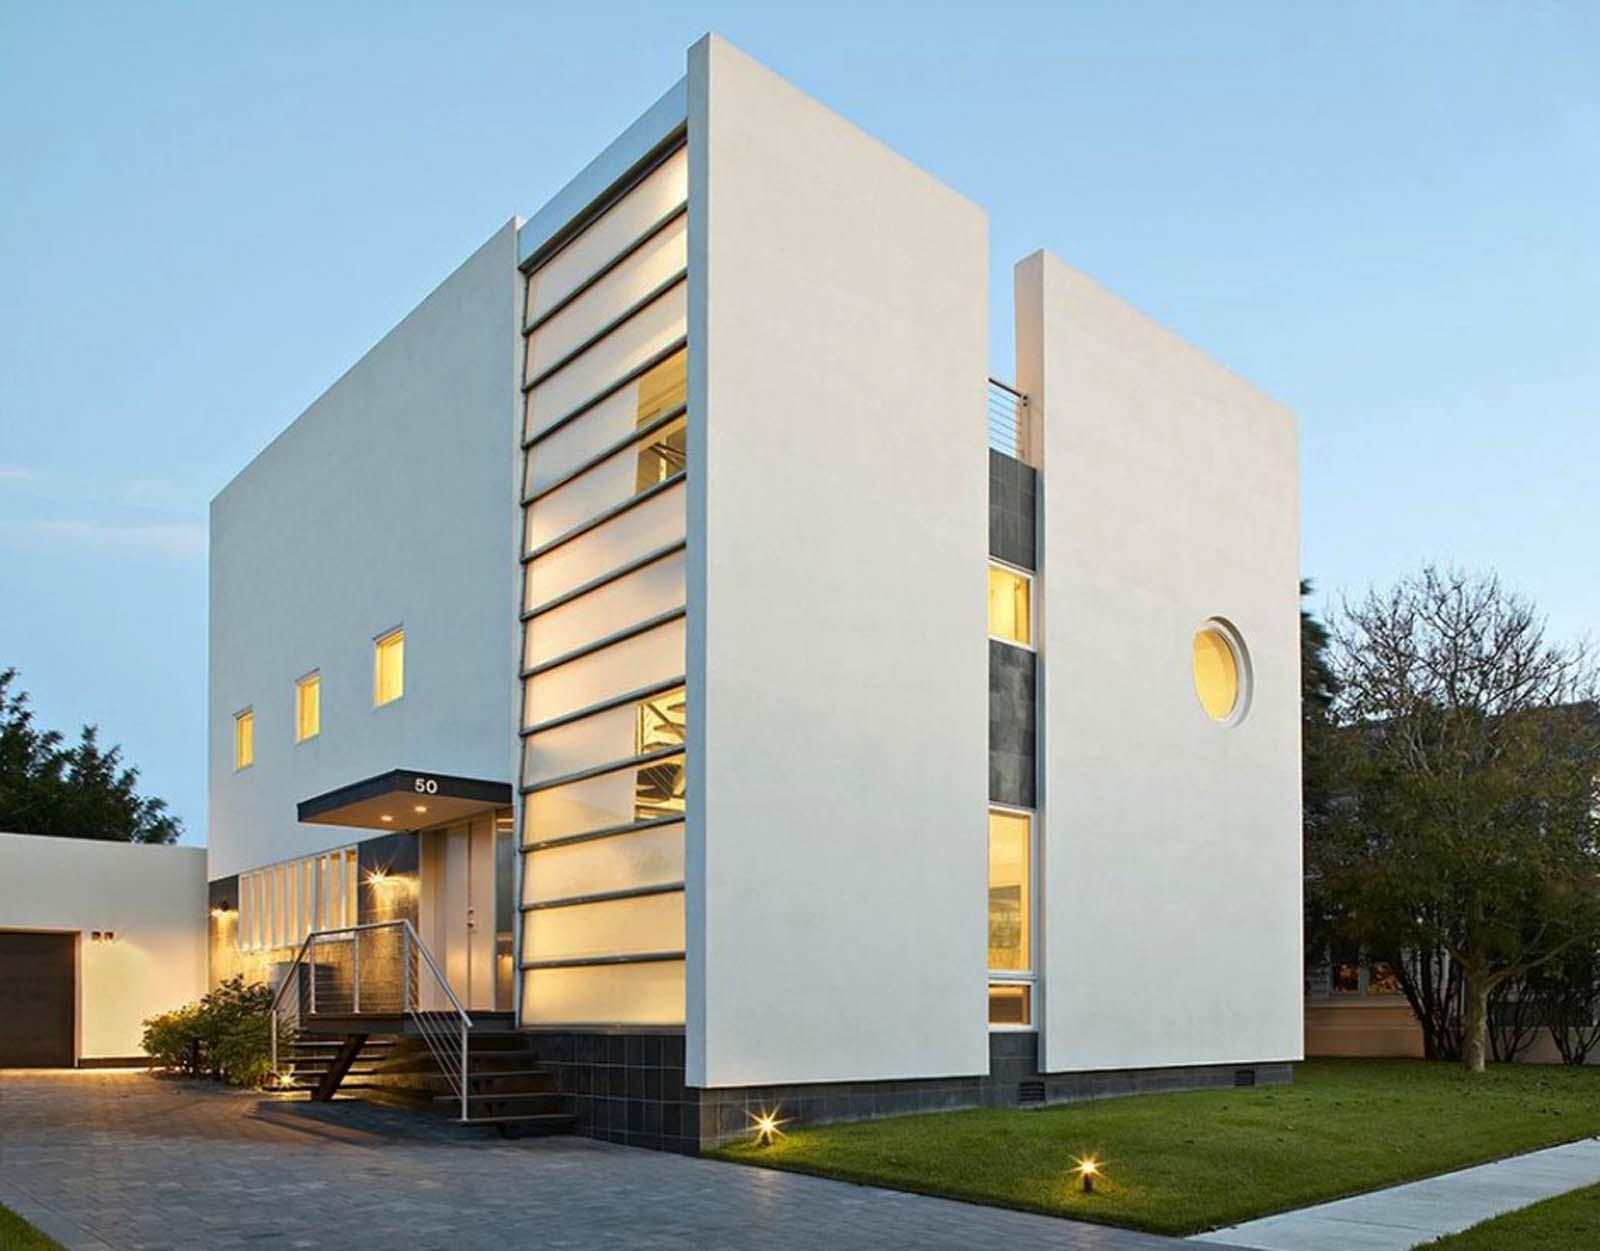 Modernist Architecture modernist gmo architecture | architecture here and there